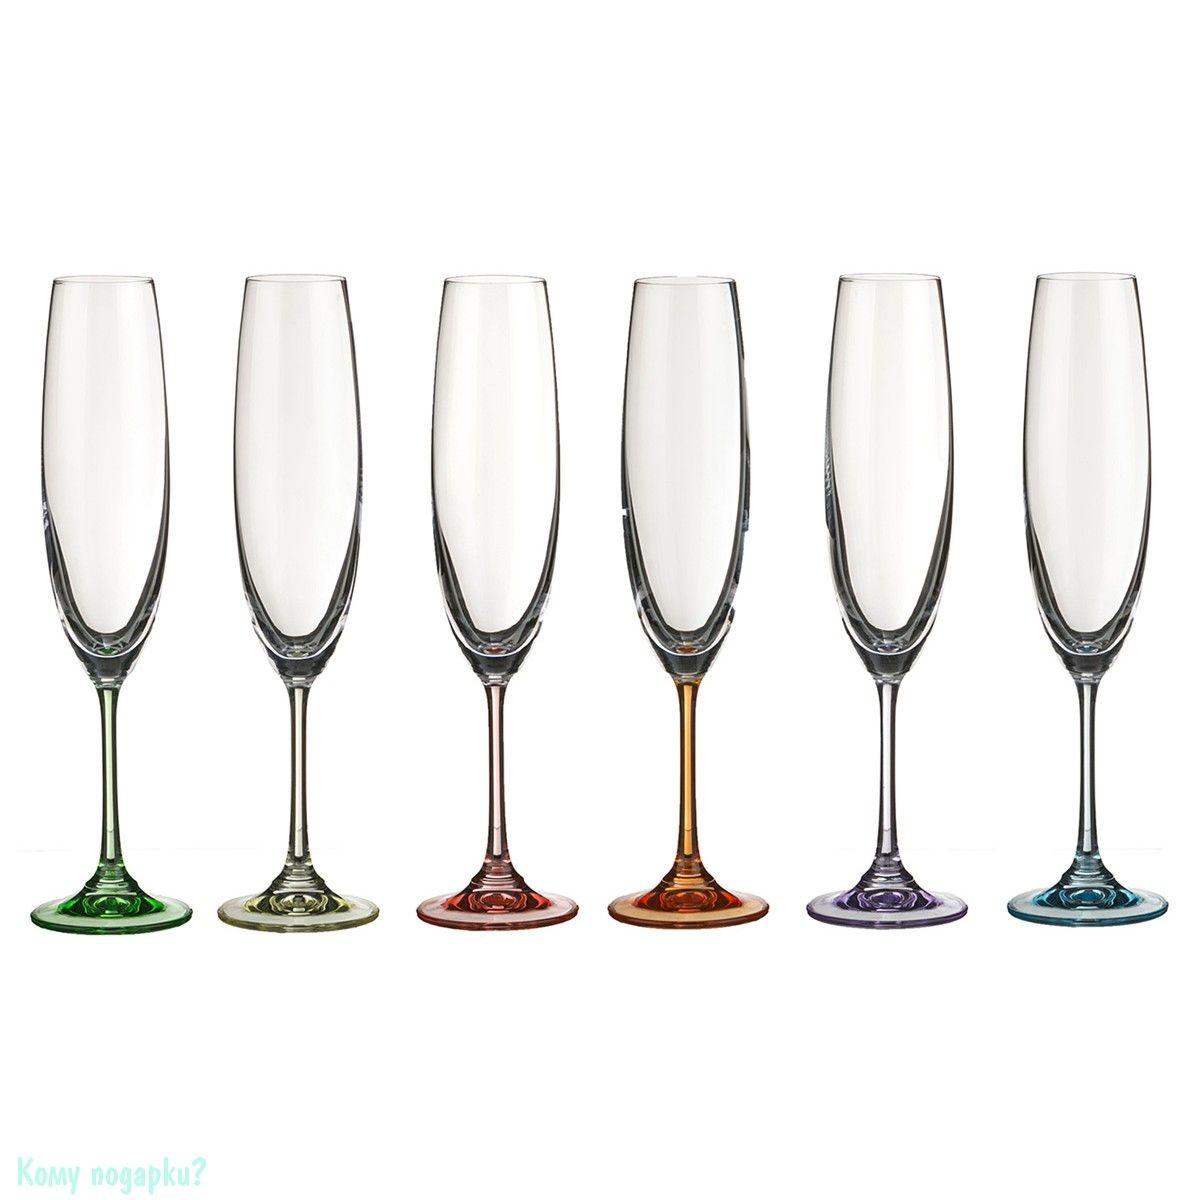 Бокалы для шампанского «Барбара декорейшн»